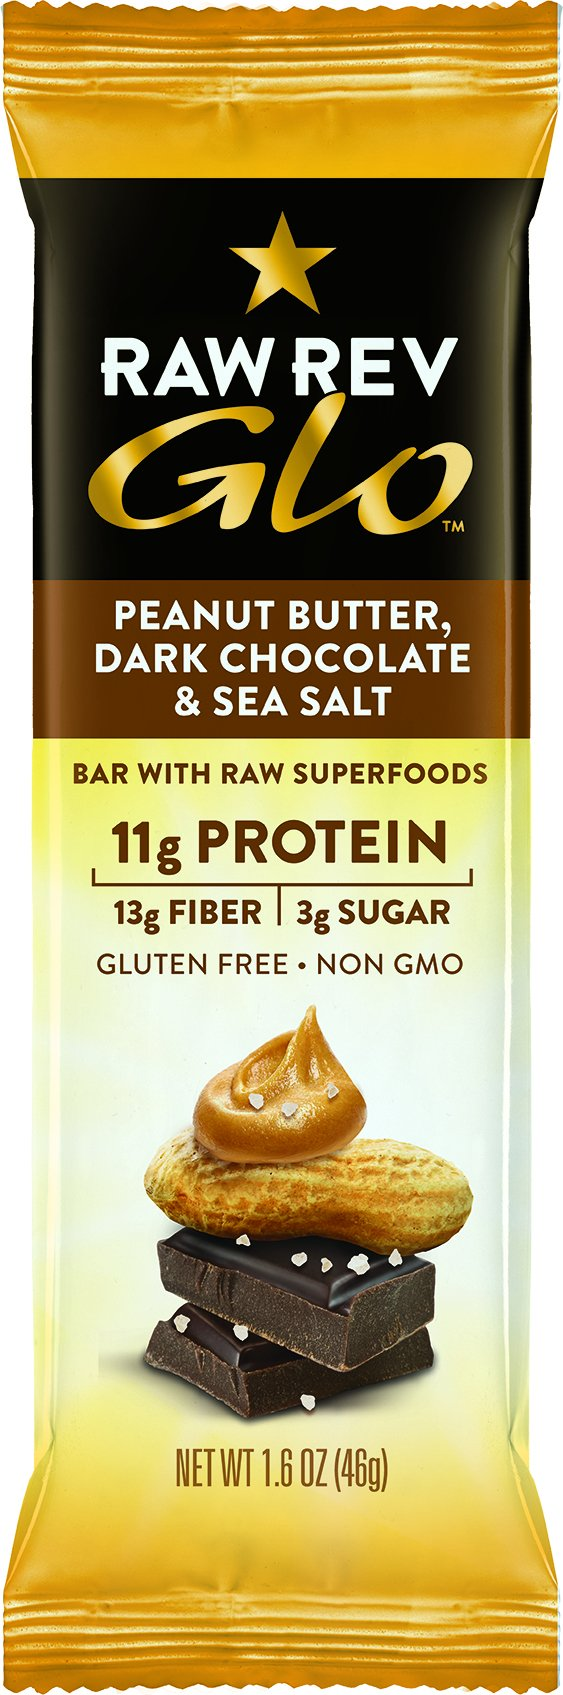 Raw Rev Glo Protein Bars, Peanut Butter, Dark Chocolate & Sea Salt, 1.6 Ounce Bar (Pack of 12)